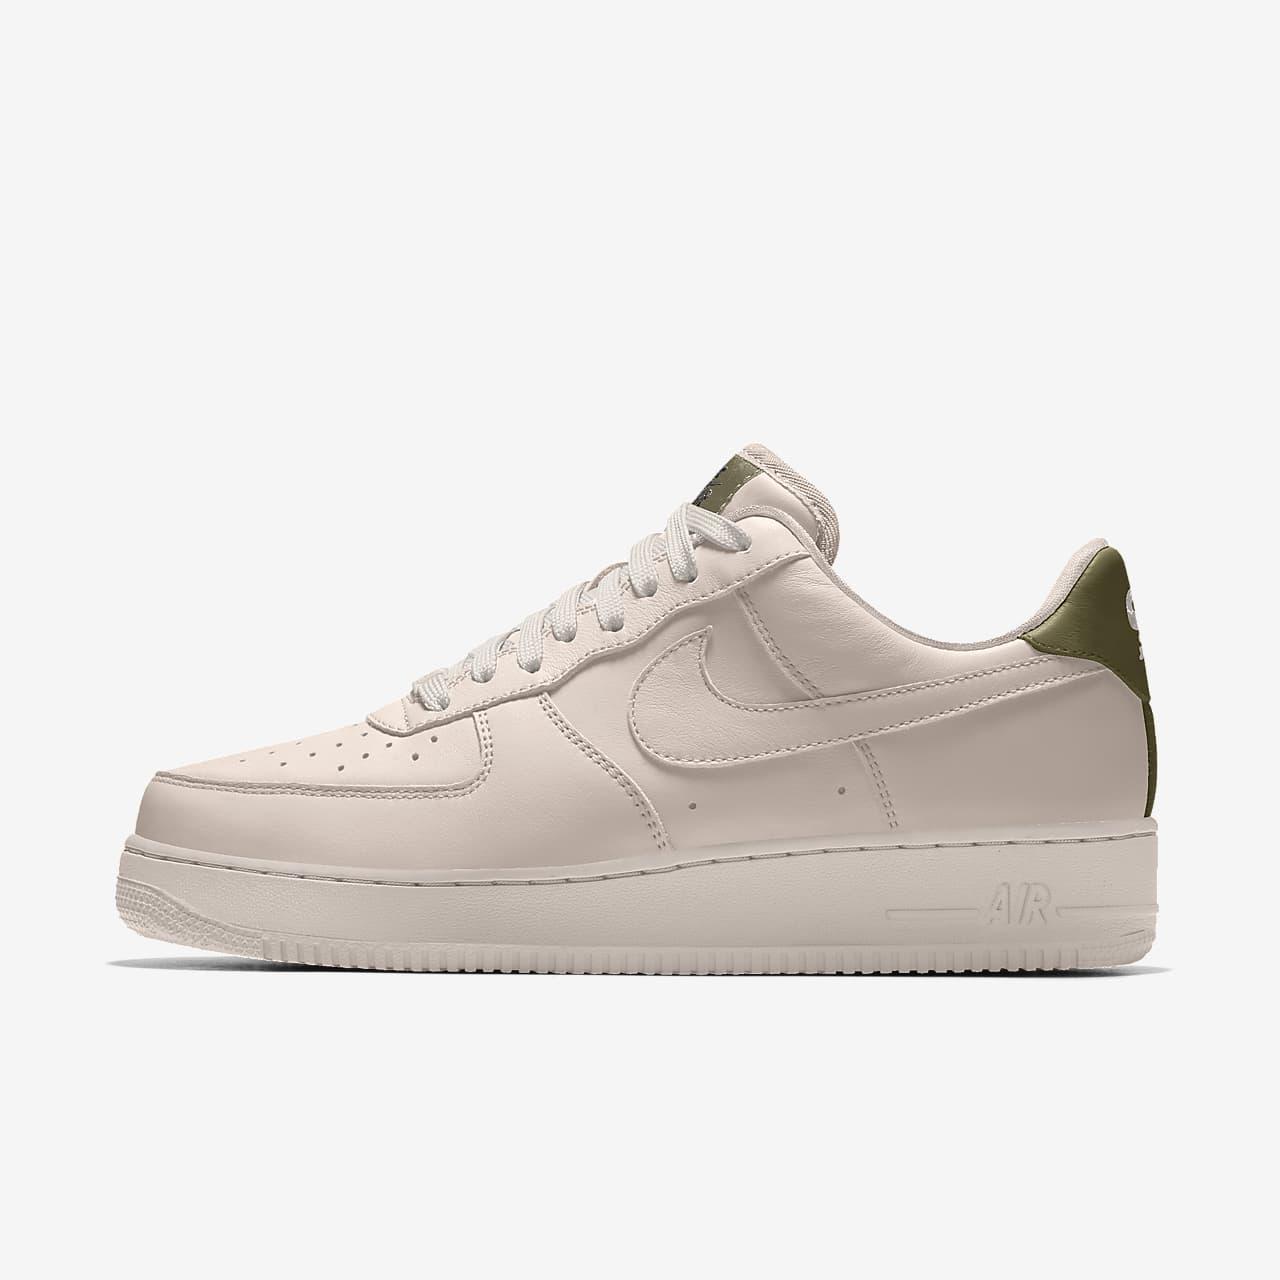 Nike Air Force 1 Low Unlocked Custom Shoe